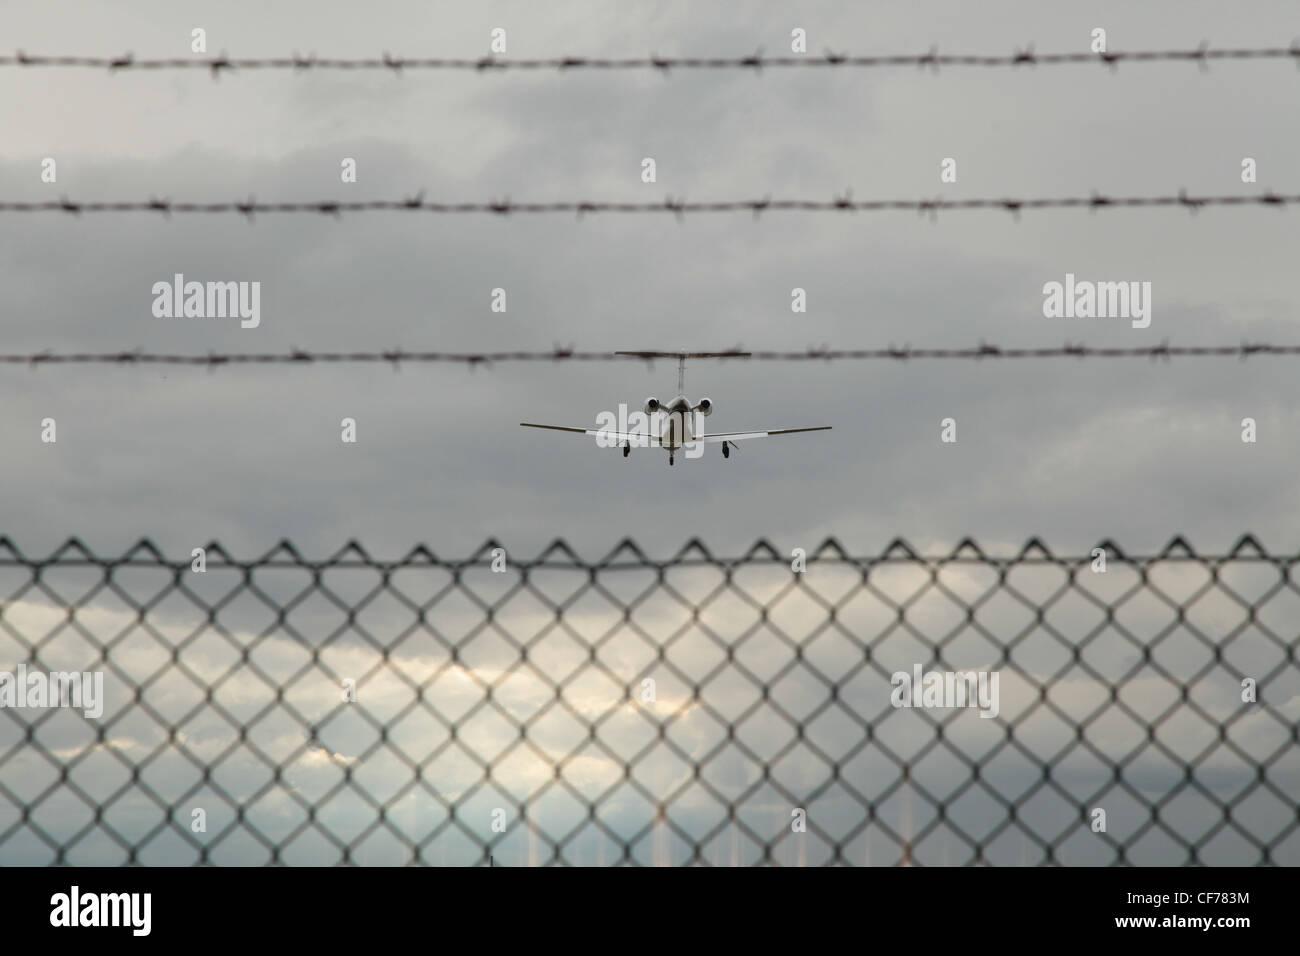 Im Landeanflug, Landing approach, Flugzeug, plane - Stock Image